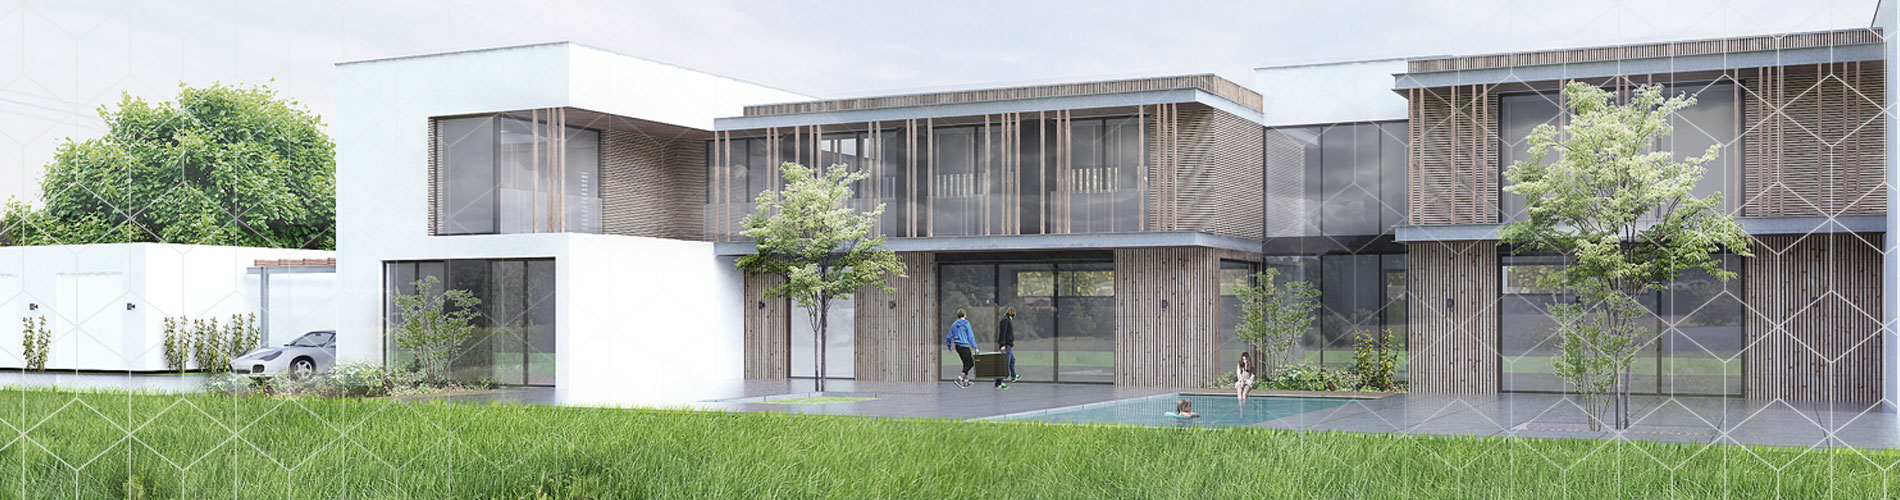 ACTU-ASB-architecte---maison-contemporaine-toit-terrasse ...